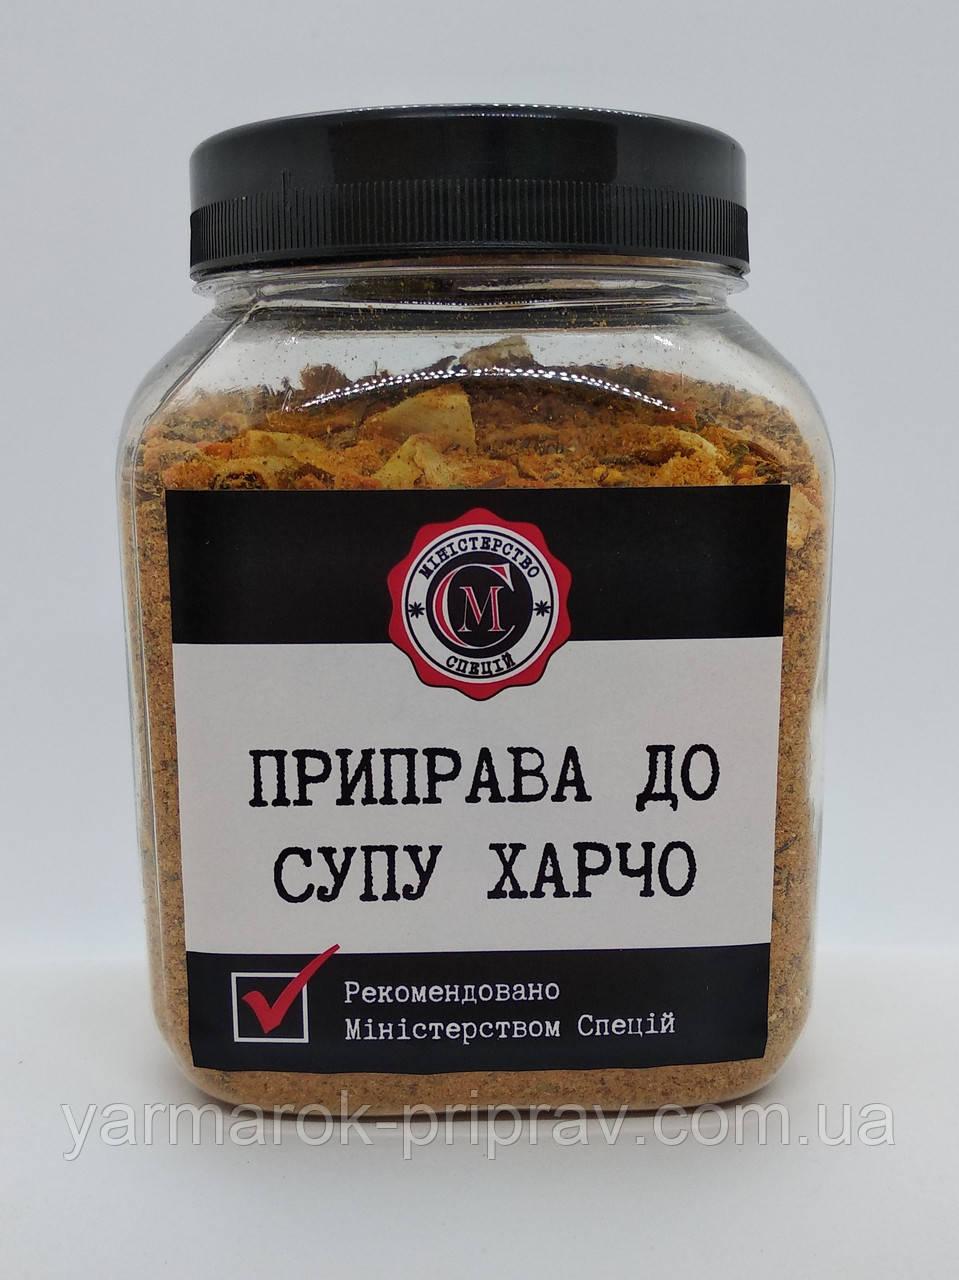 Приправа для супа харчо, 260г